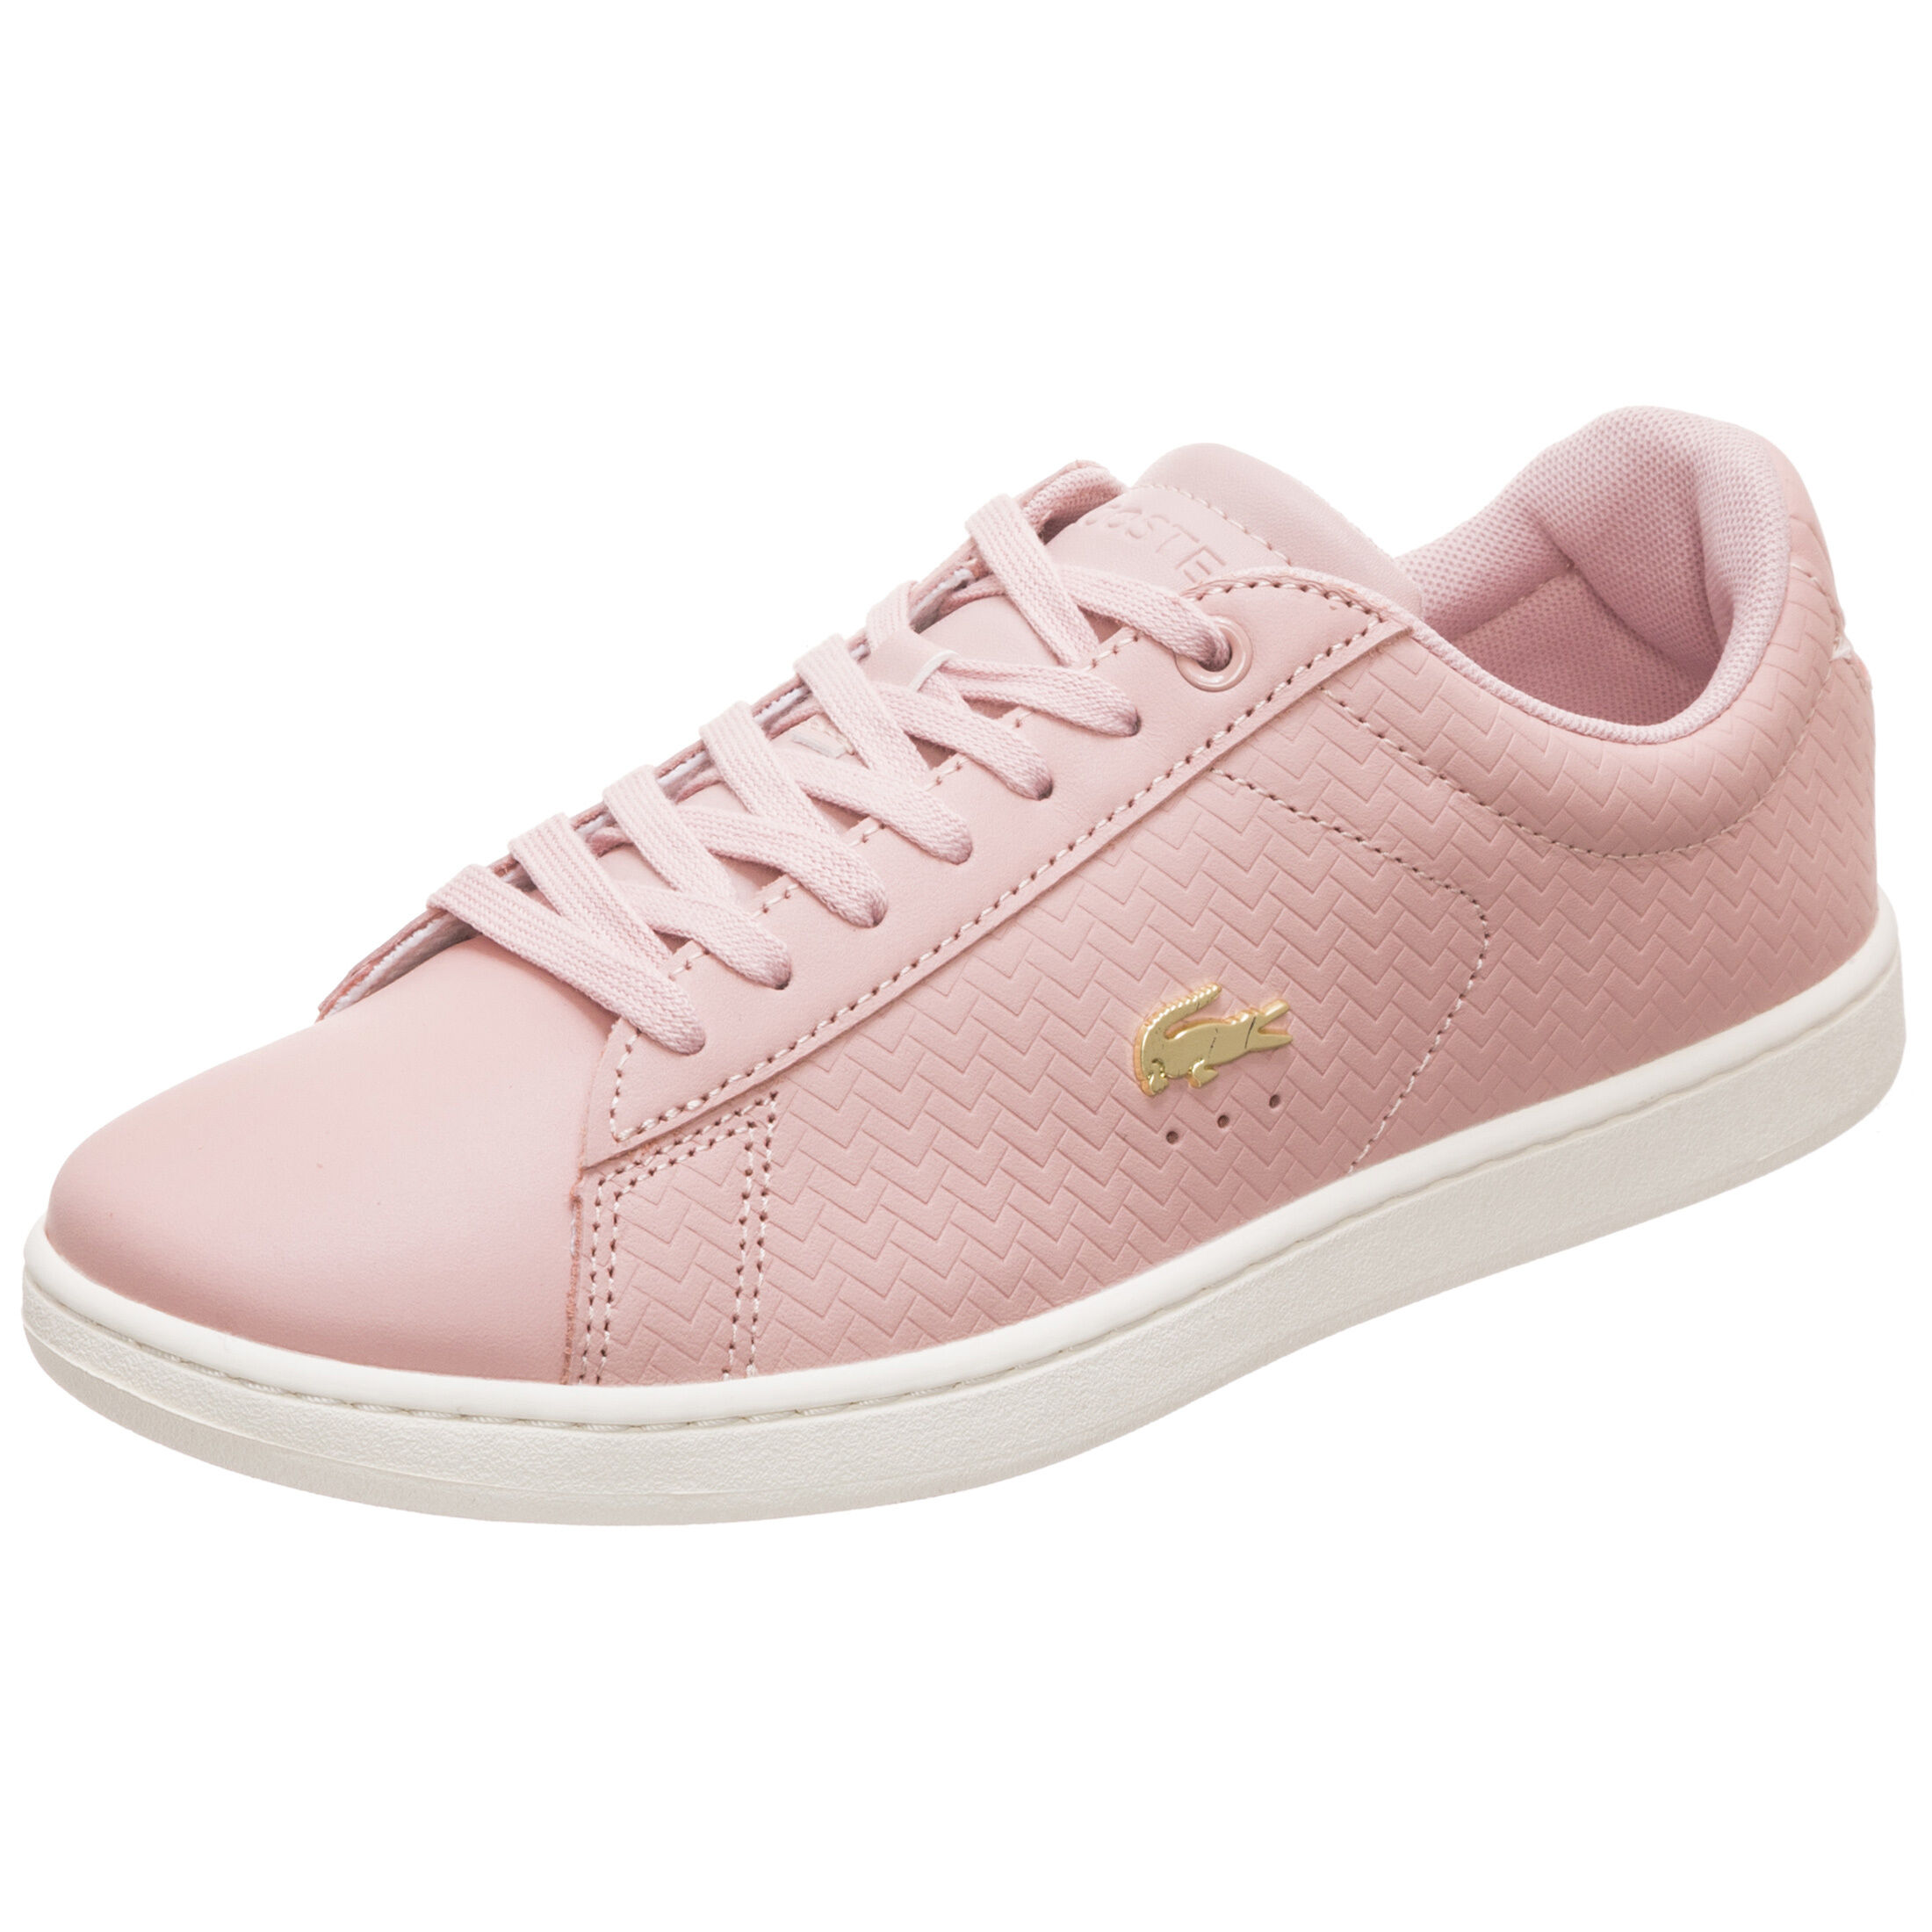 Schuhe | Frauen Lifestyle bei OUTFITTER